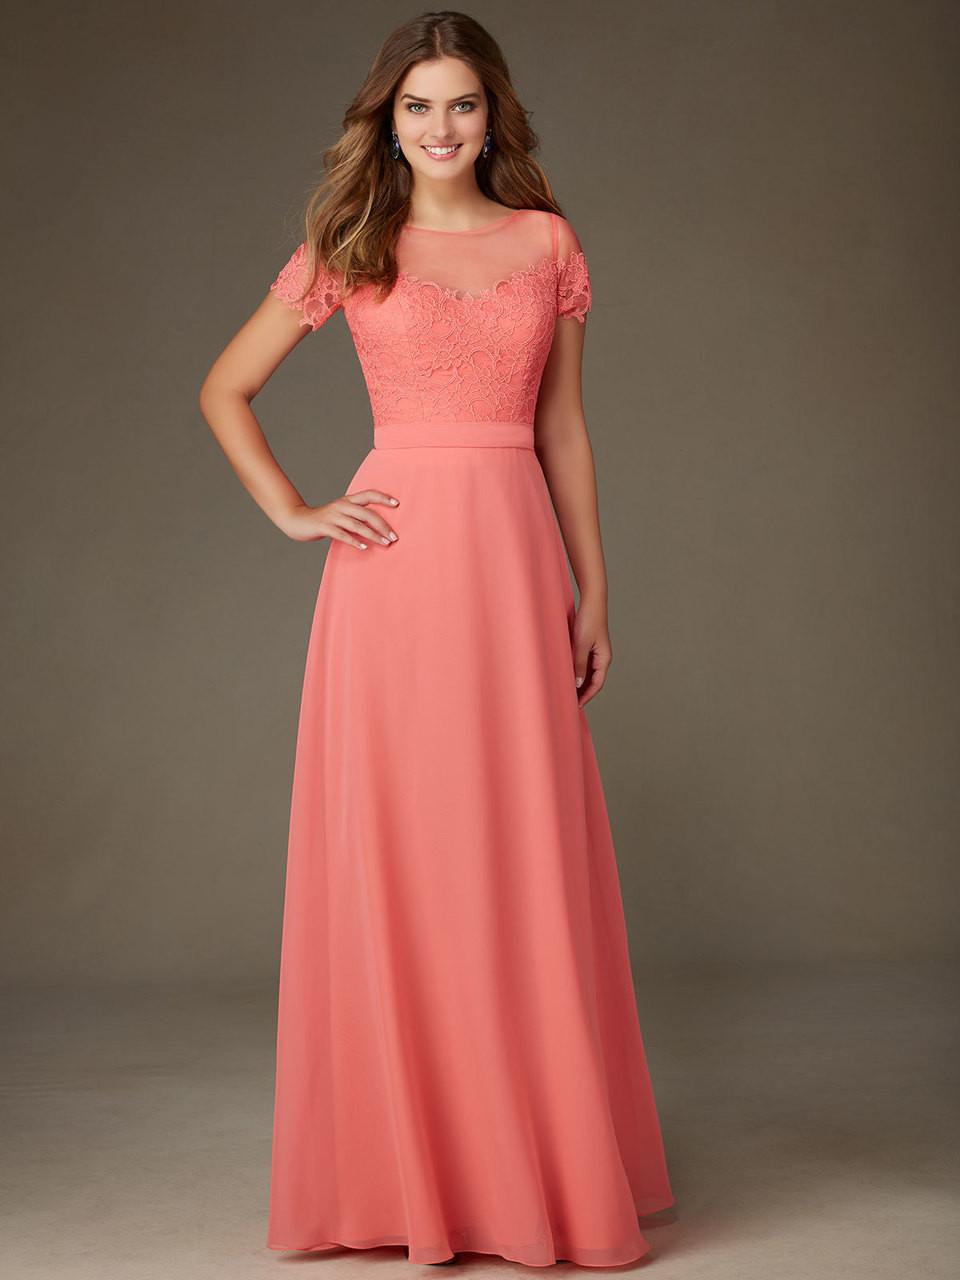 5c74858fae2 Mori Lee 124 Short Sleeves Chiffon A-line Bridesmaid Dress - Dimitra ...